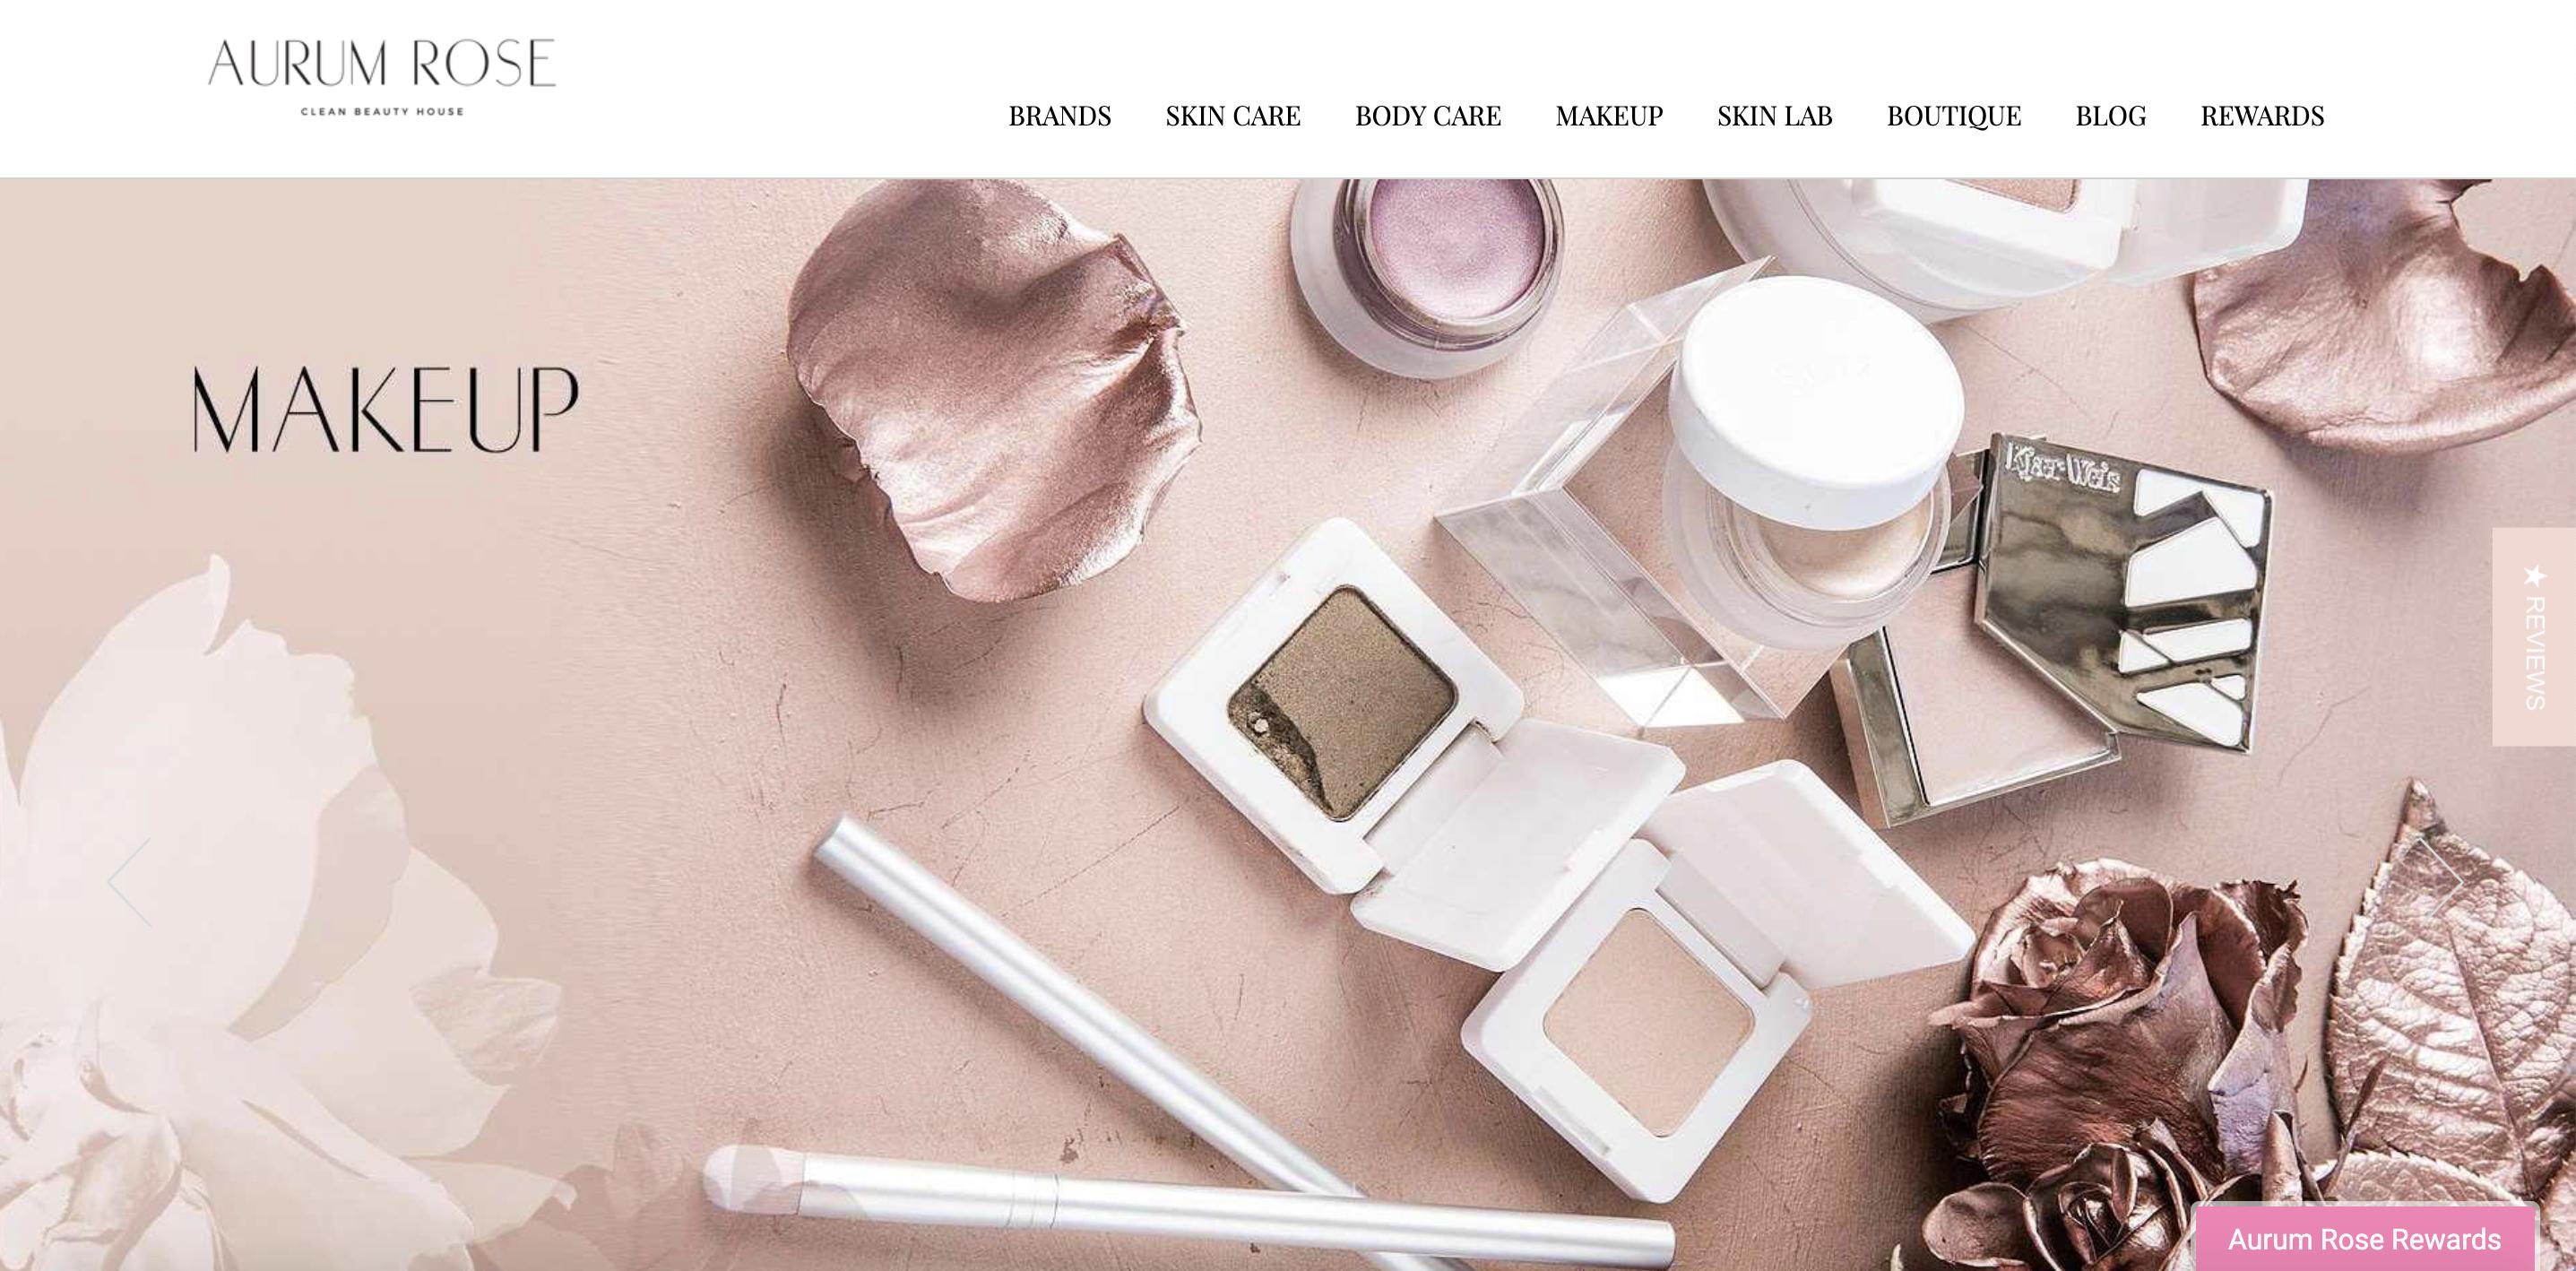 Aurum Rose Clean Beauty Store esempio